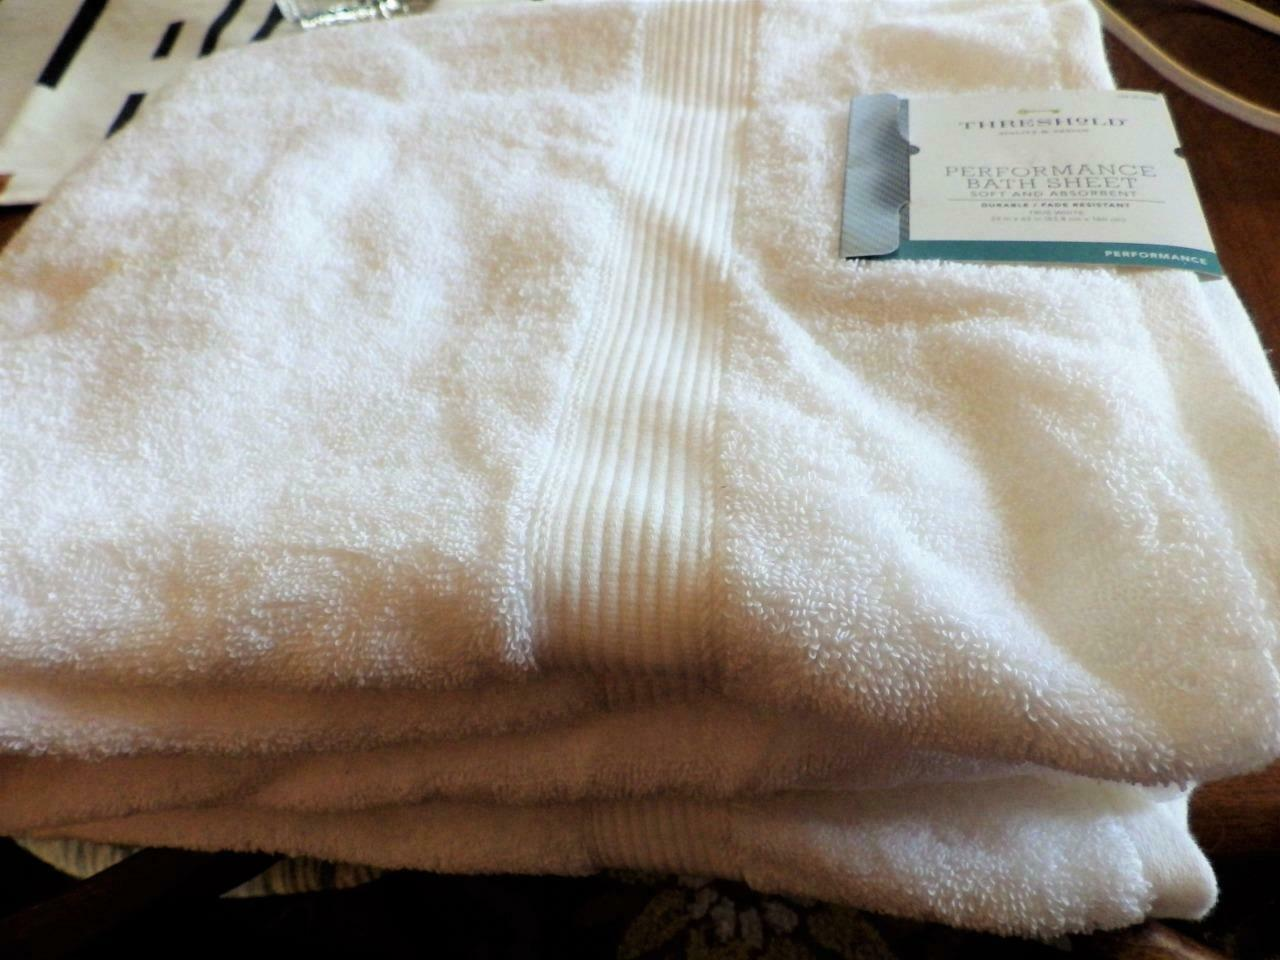 2 Performance Bath Sheets Towels Threshold True White 100% Cotton Target - $27.72